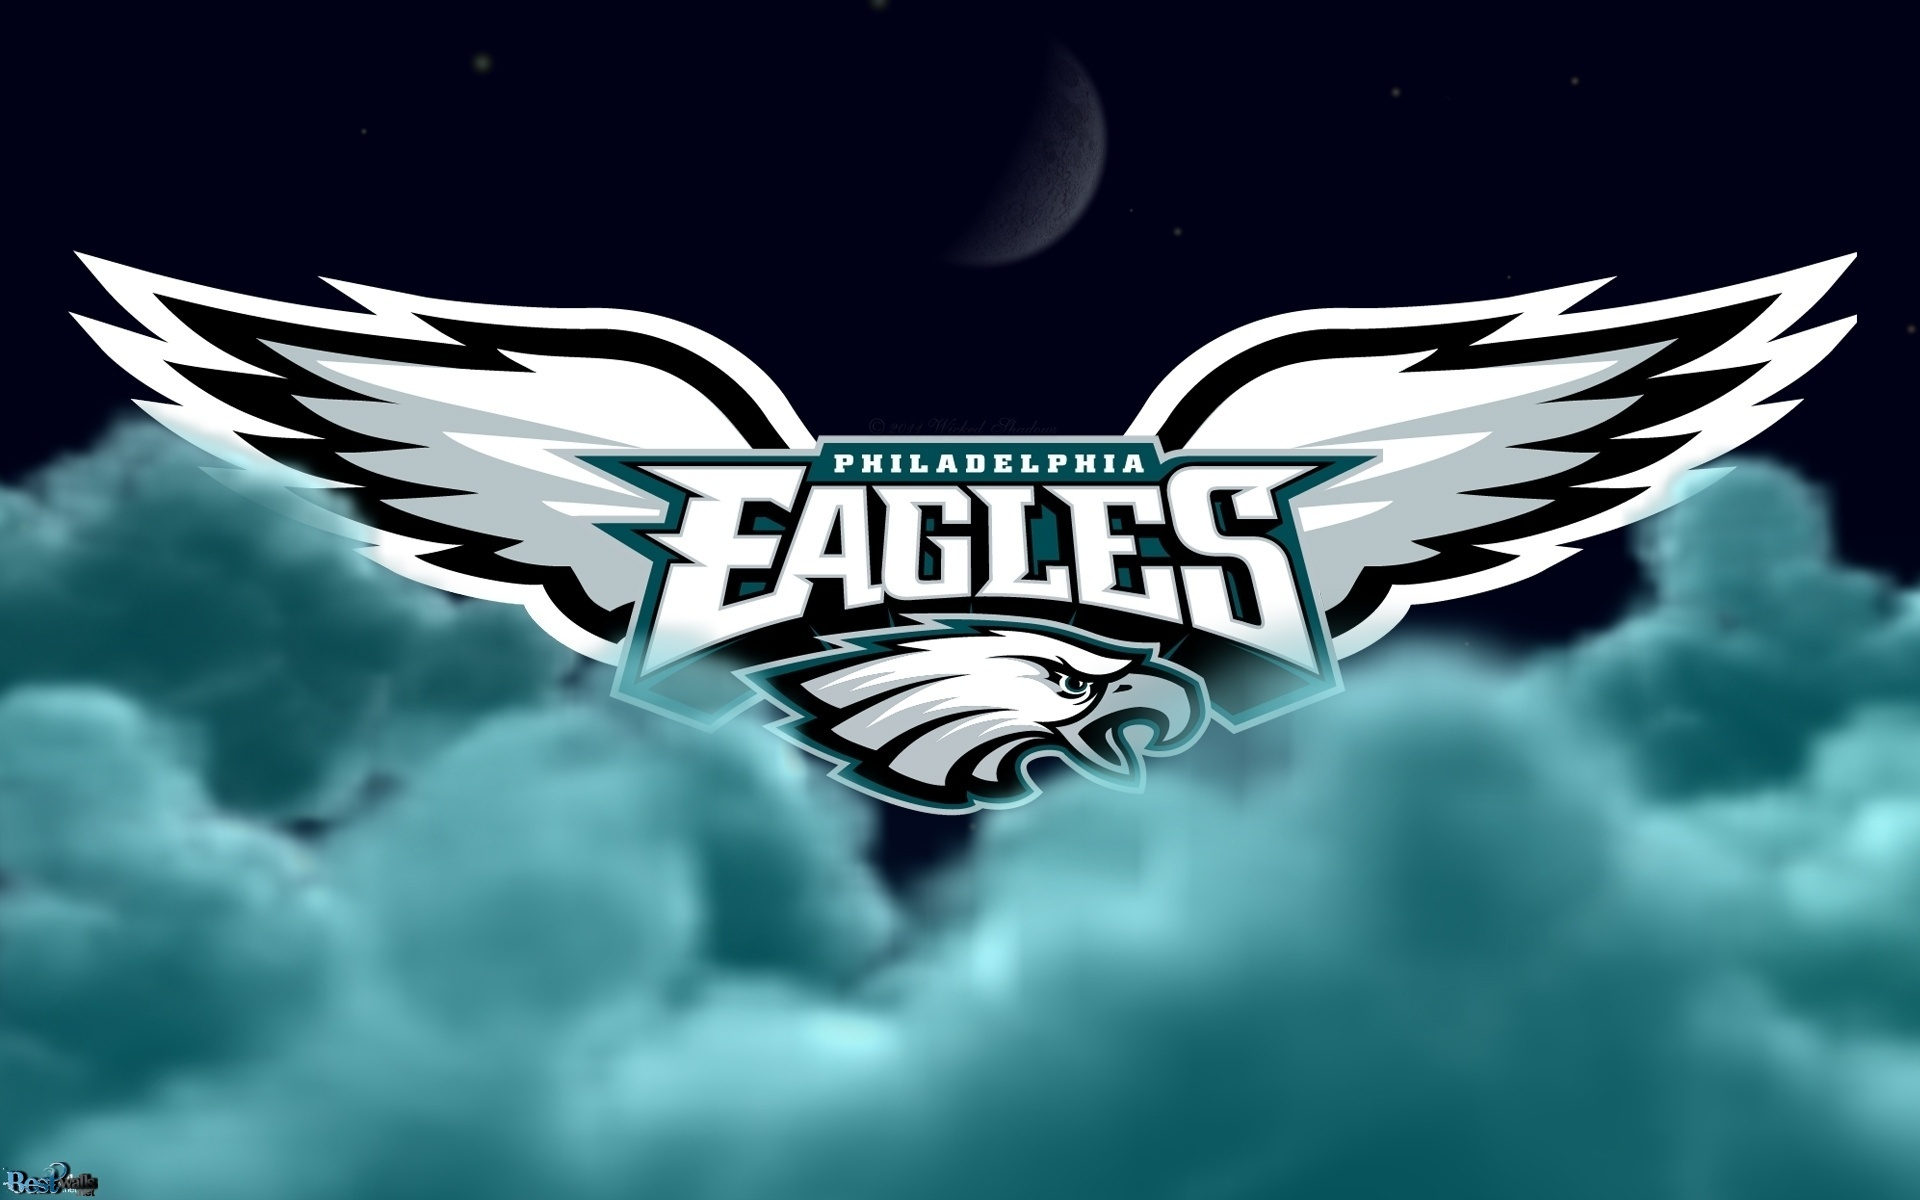 Philadelphia Eagles Images & Pics